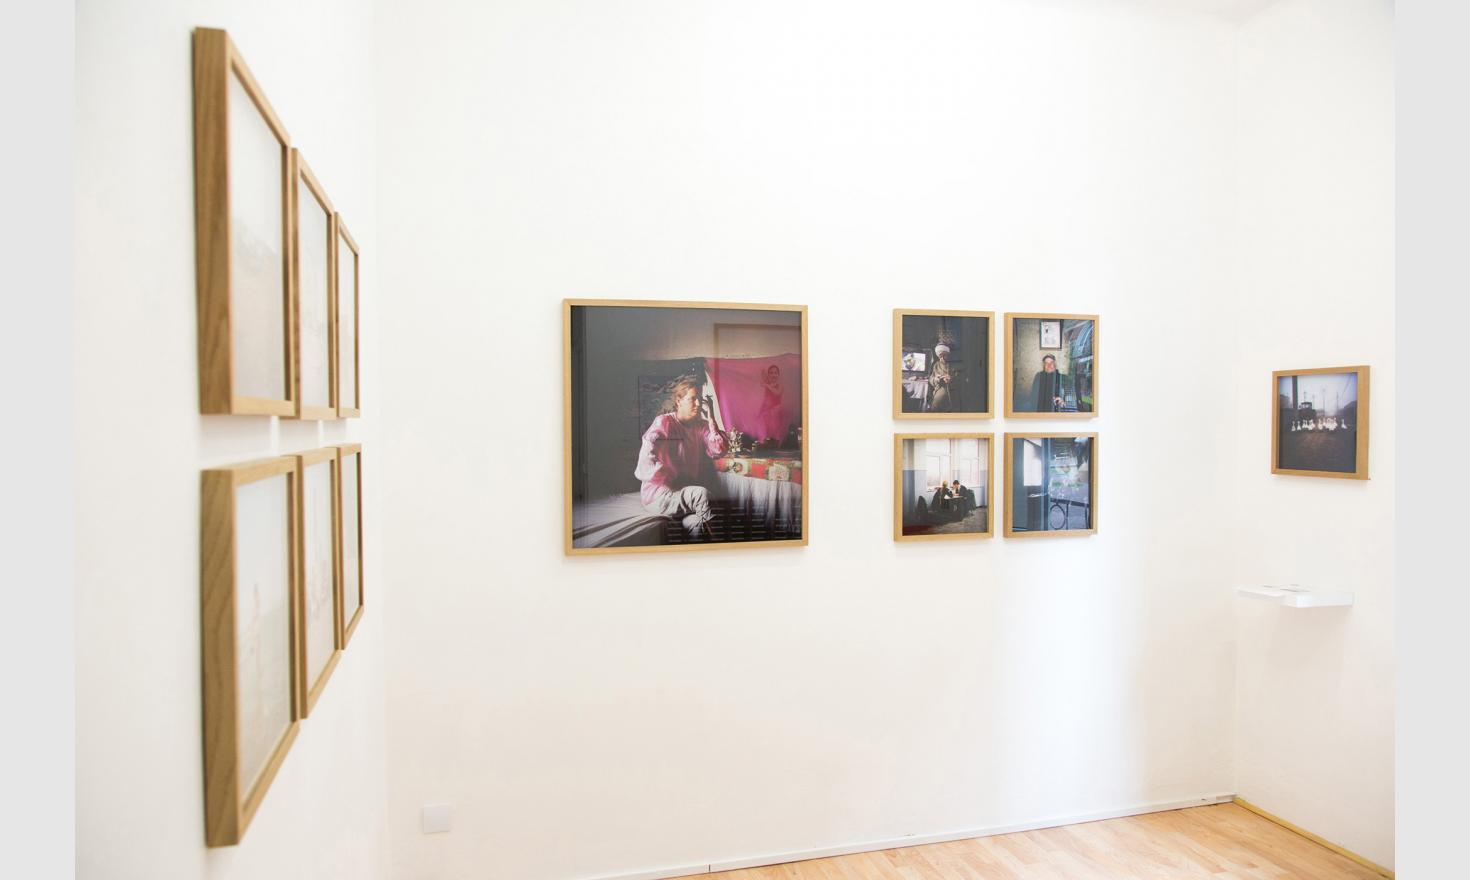 © Simon Lourié / Galerie Le 247 / www.le247.fr